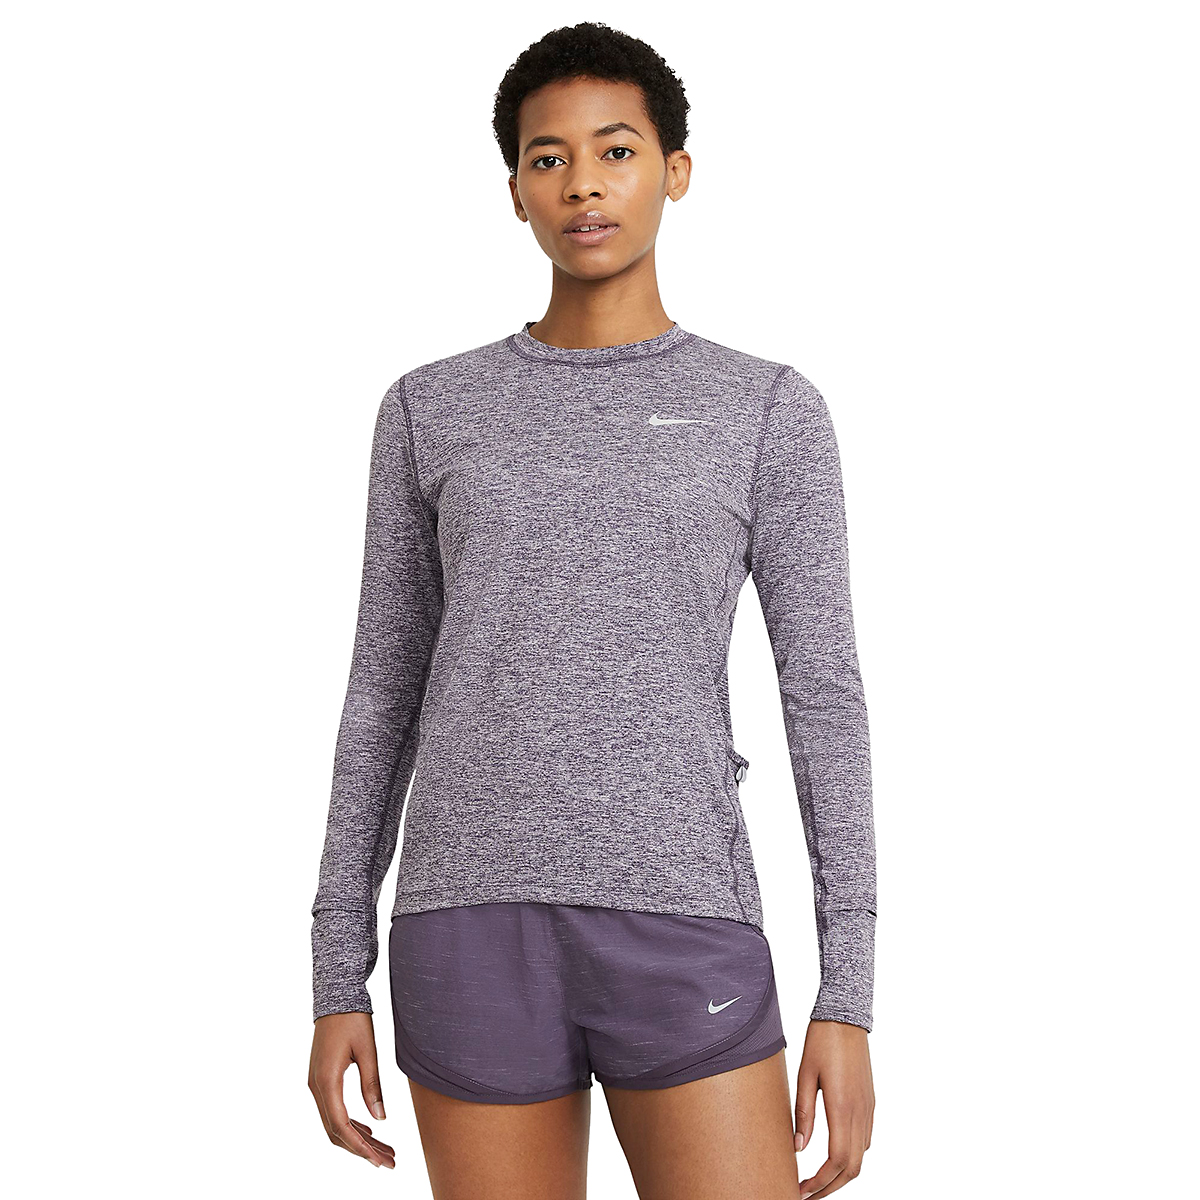 Women's Nike Element Crew Long Sleeve - Color: Dark Raisin/Light Violet/Reflective Silver - Size: XS, Dark Raisin/Light Violet/Reflective Silver, large, image 1